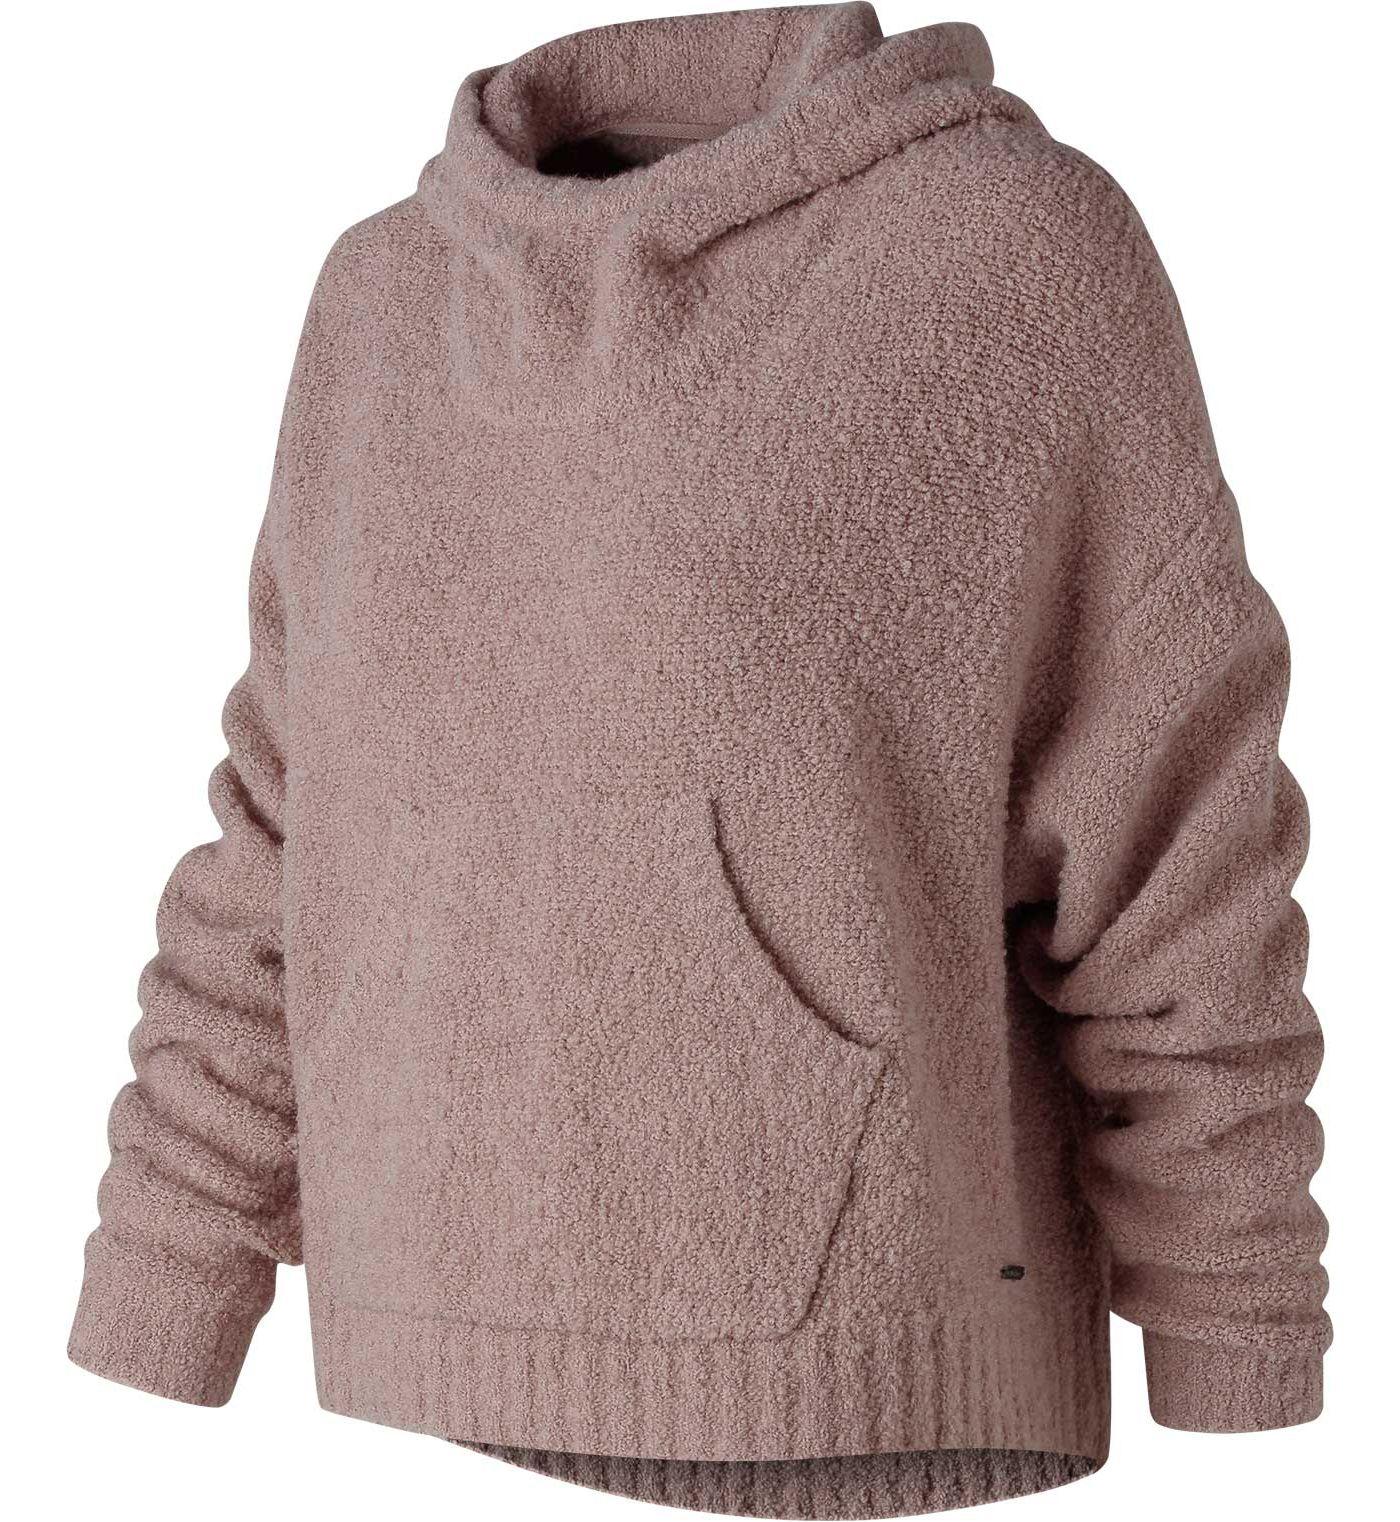 New Balance Women's Boucle Cozy Crop Hoodie